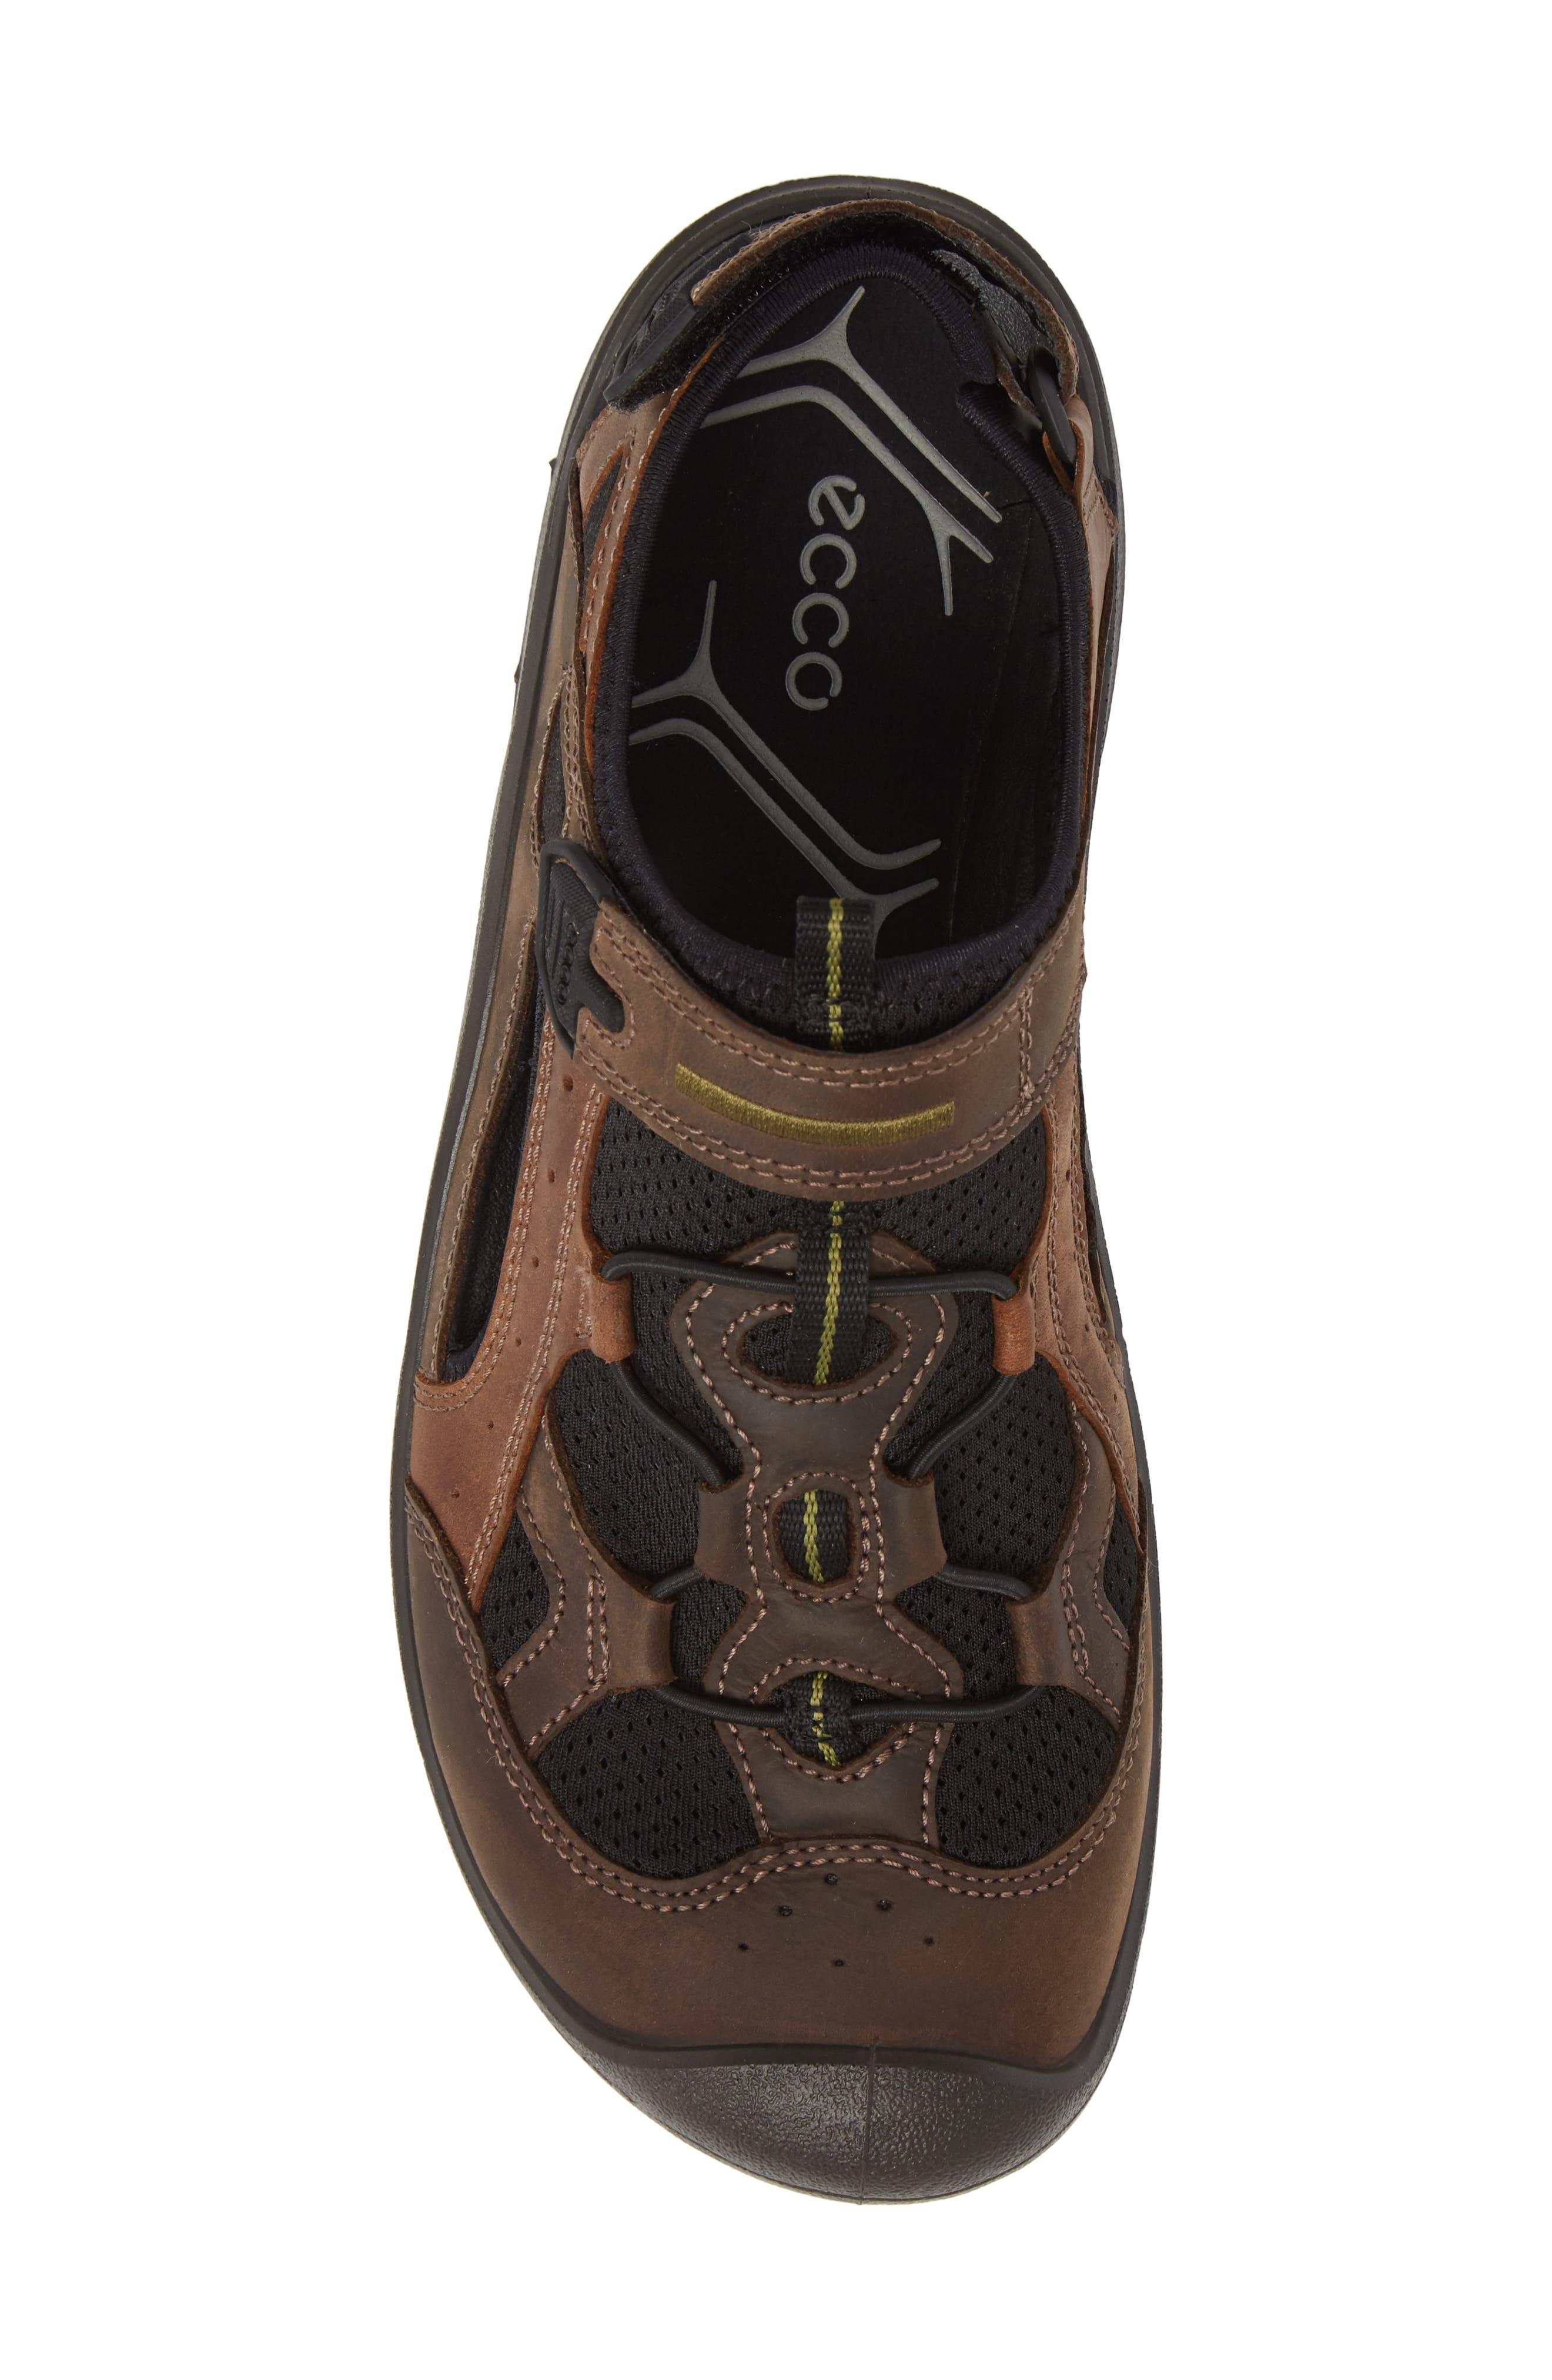 BIOM Delta Fisherman Sandal,                             Alternate thumbnail 5, color,                             Coffee Leather